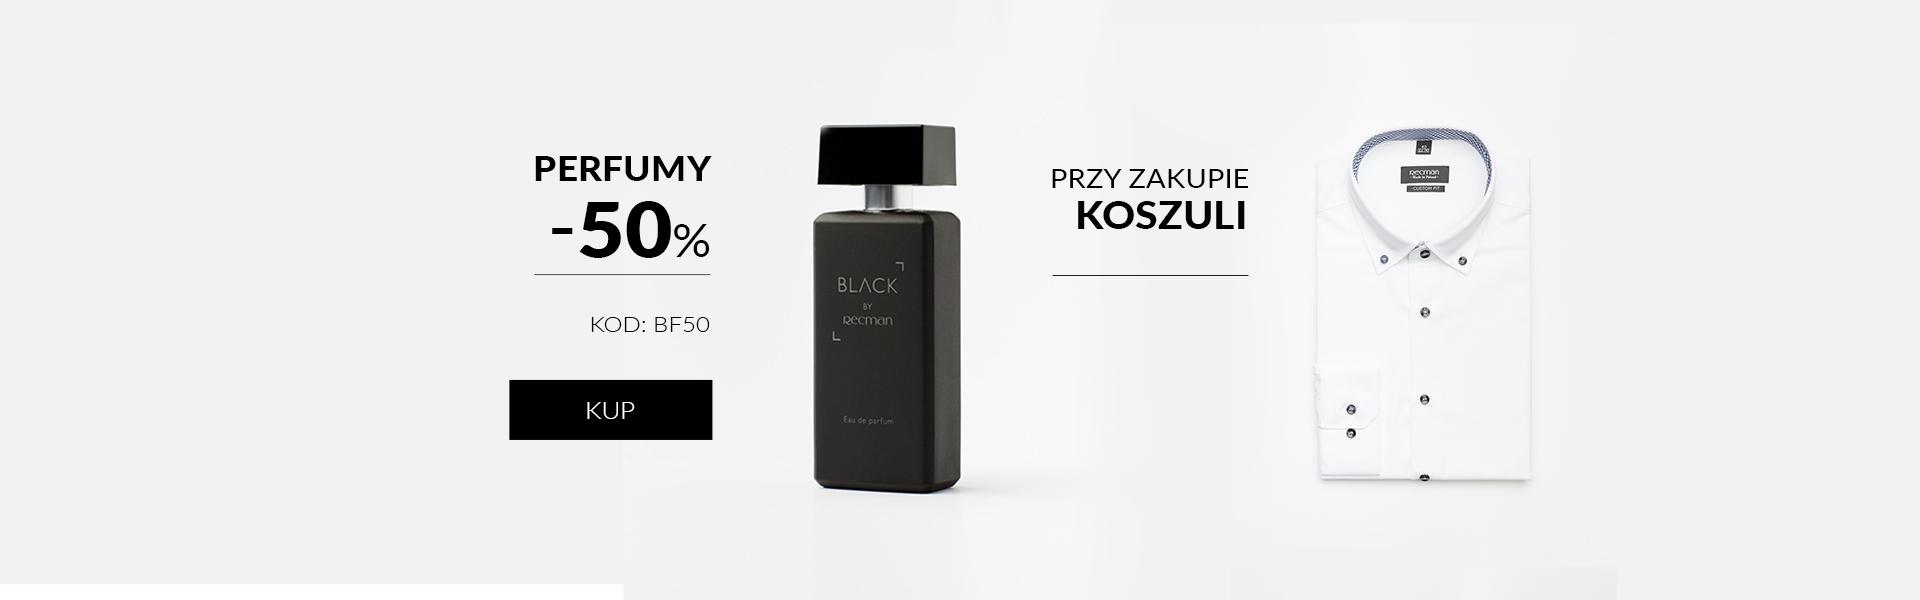 Perfumy - 50%